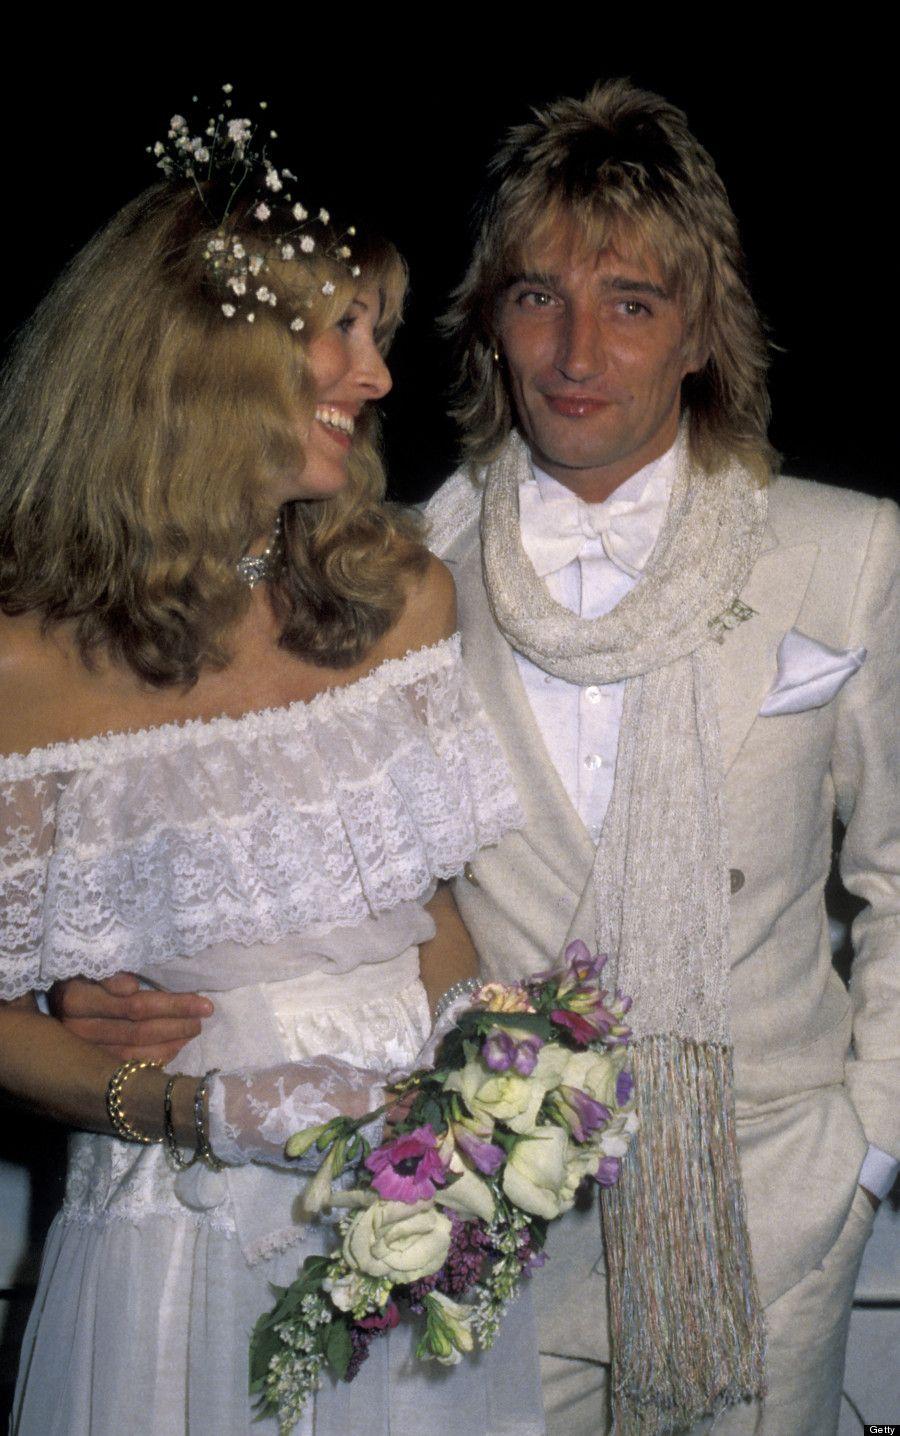 Rod Stewart And Alana Hamilton In 1979 Celebrity Wedding Photos Celebrity Weddings Hollywood Wedding